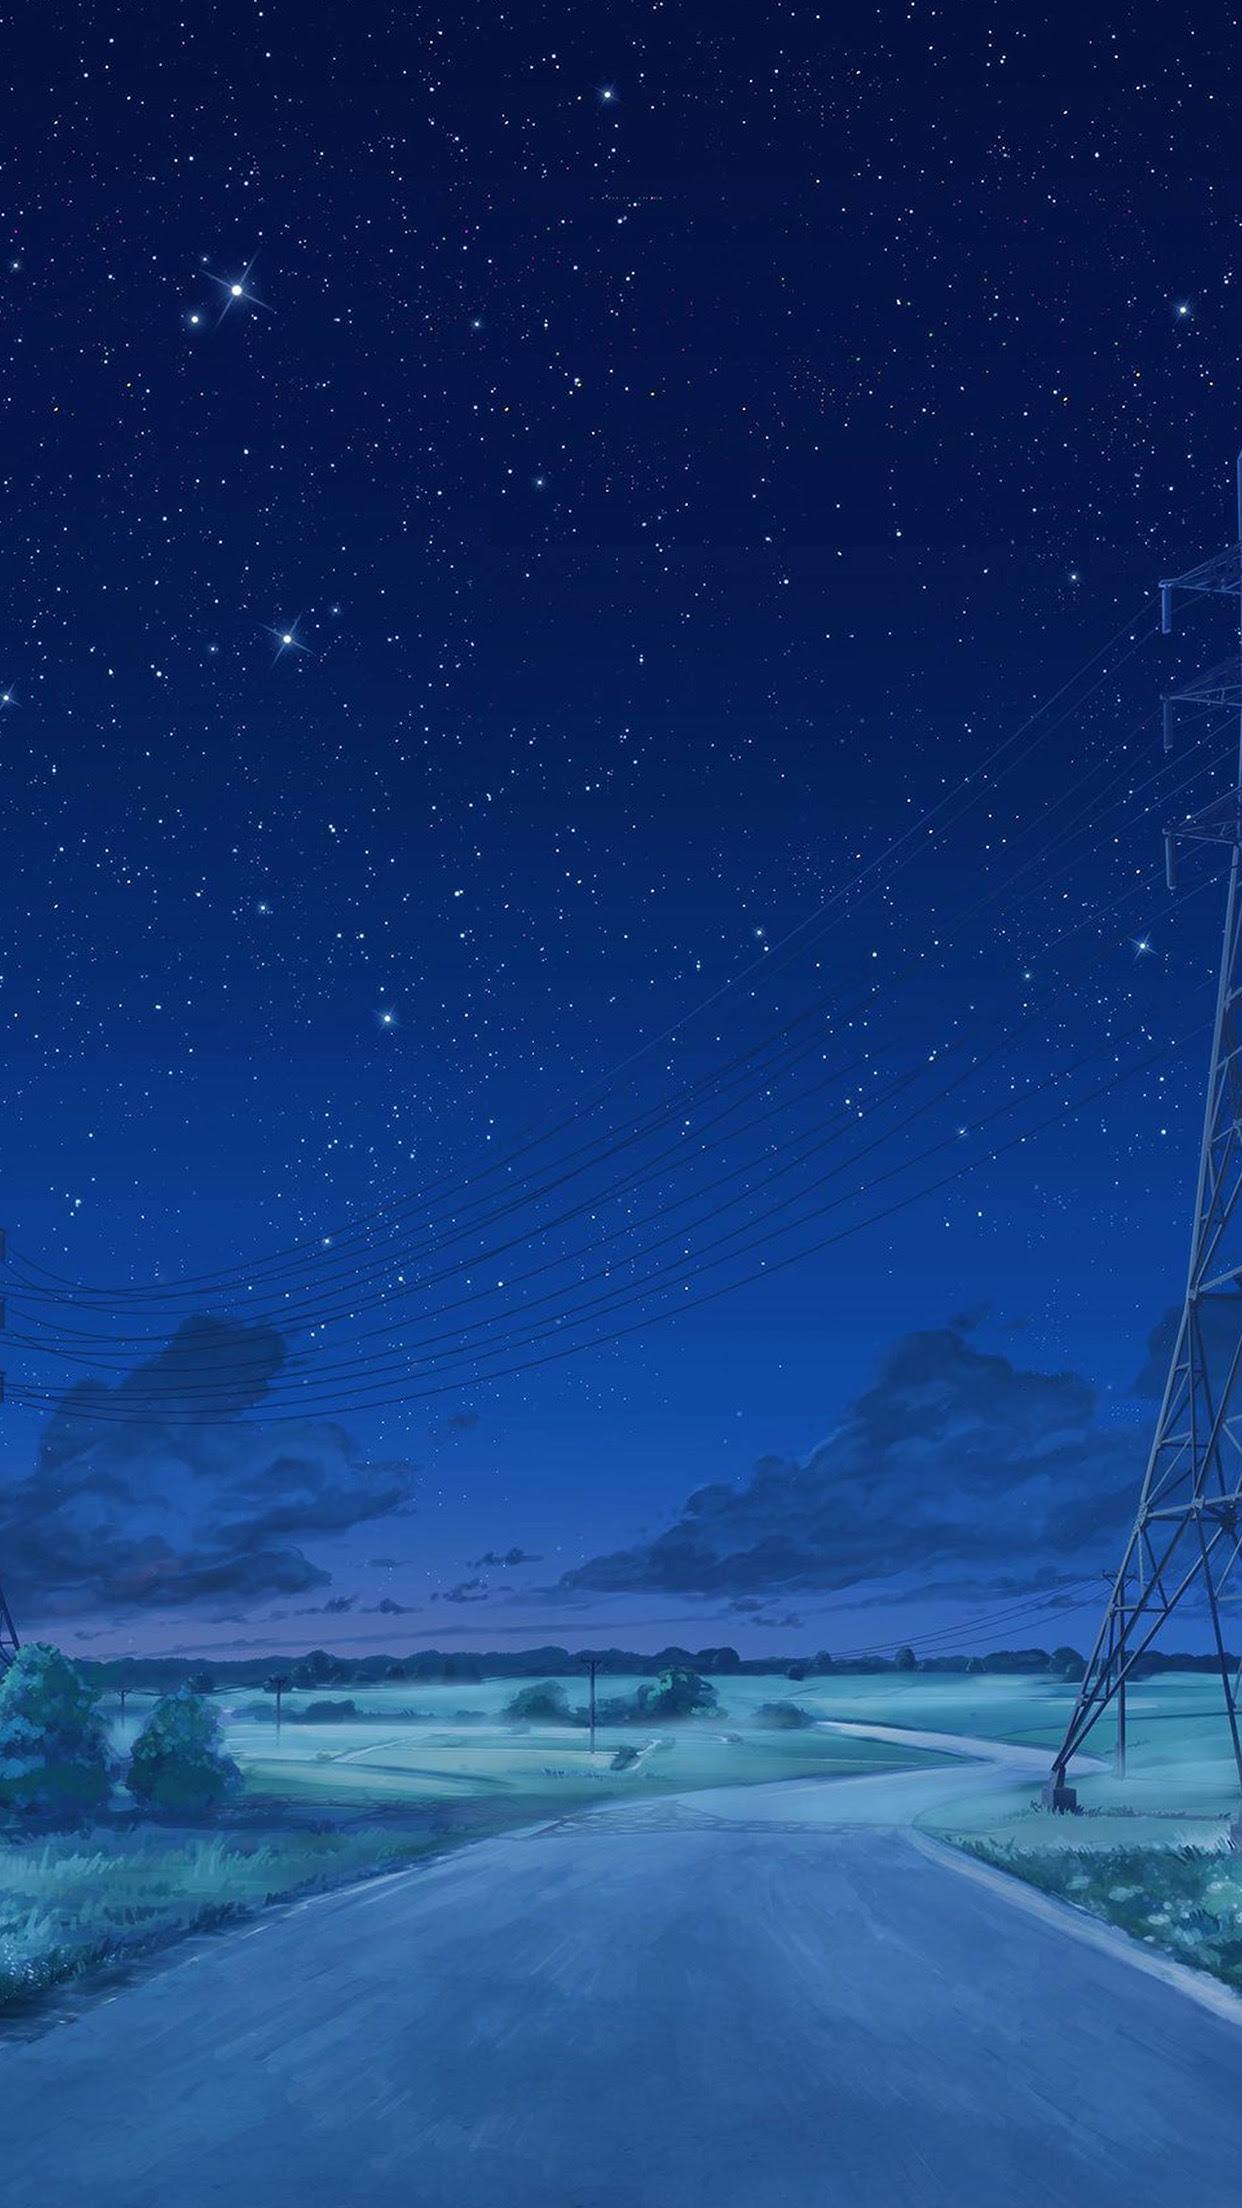 Download 98+ Wallpaper Hd Anime Sky HD Paling Keren